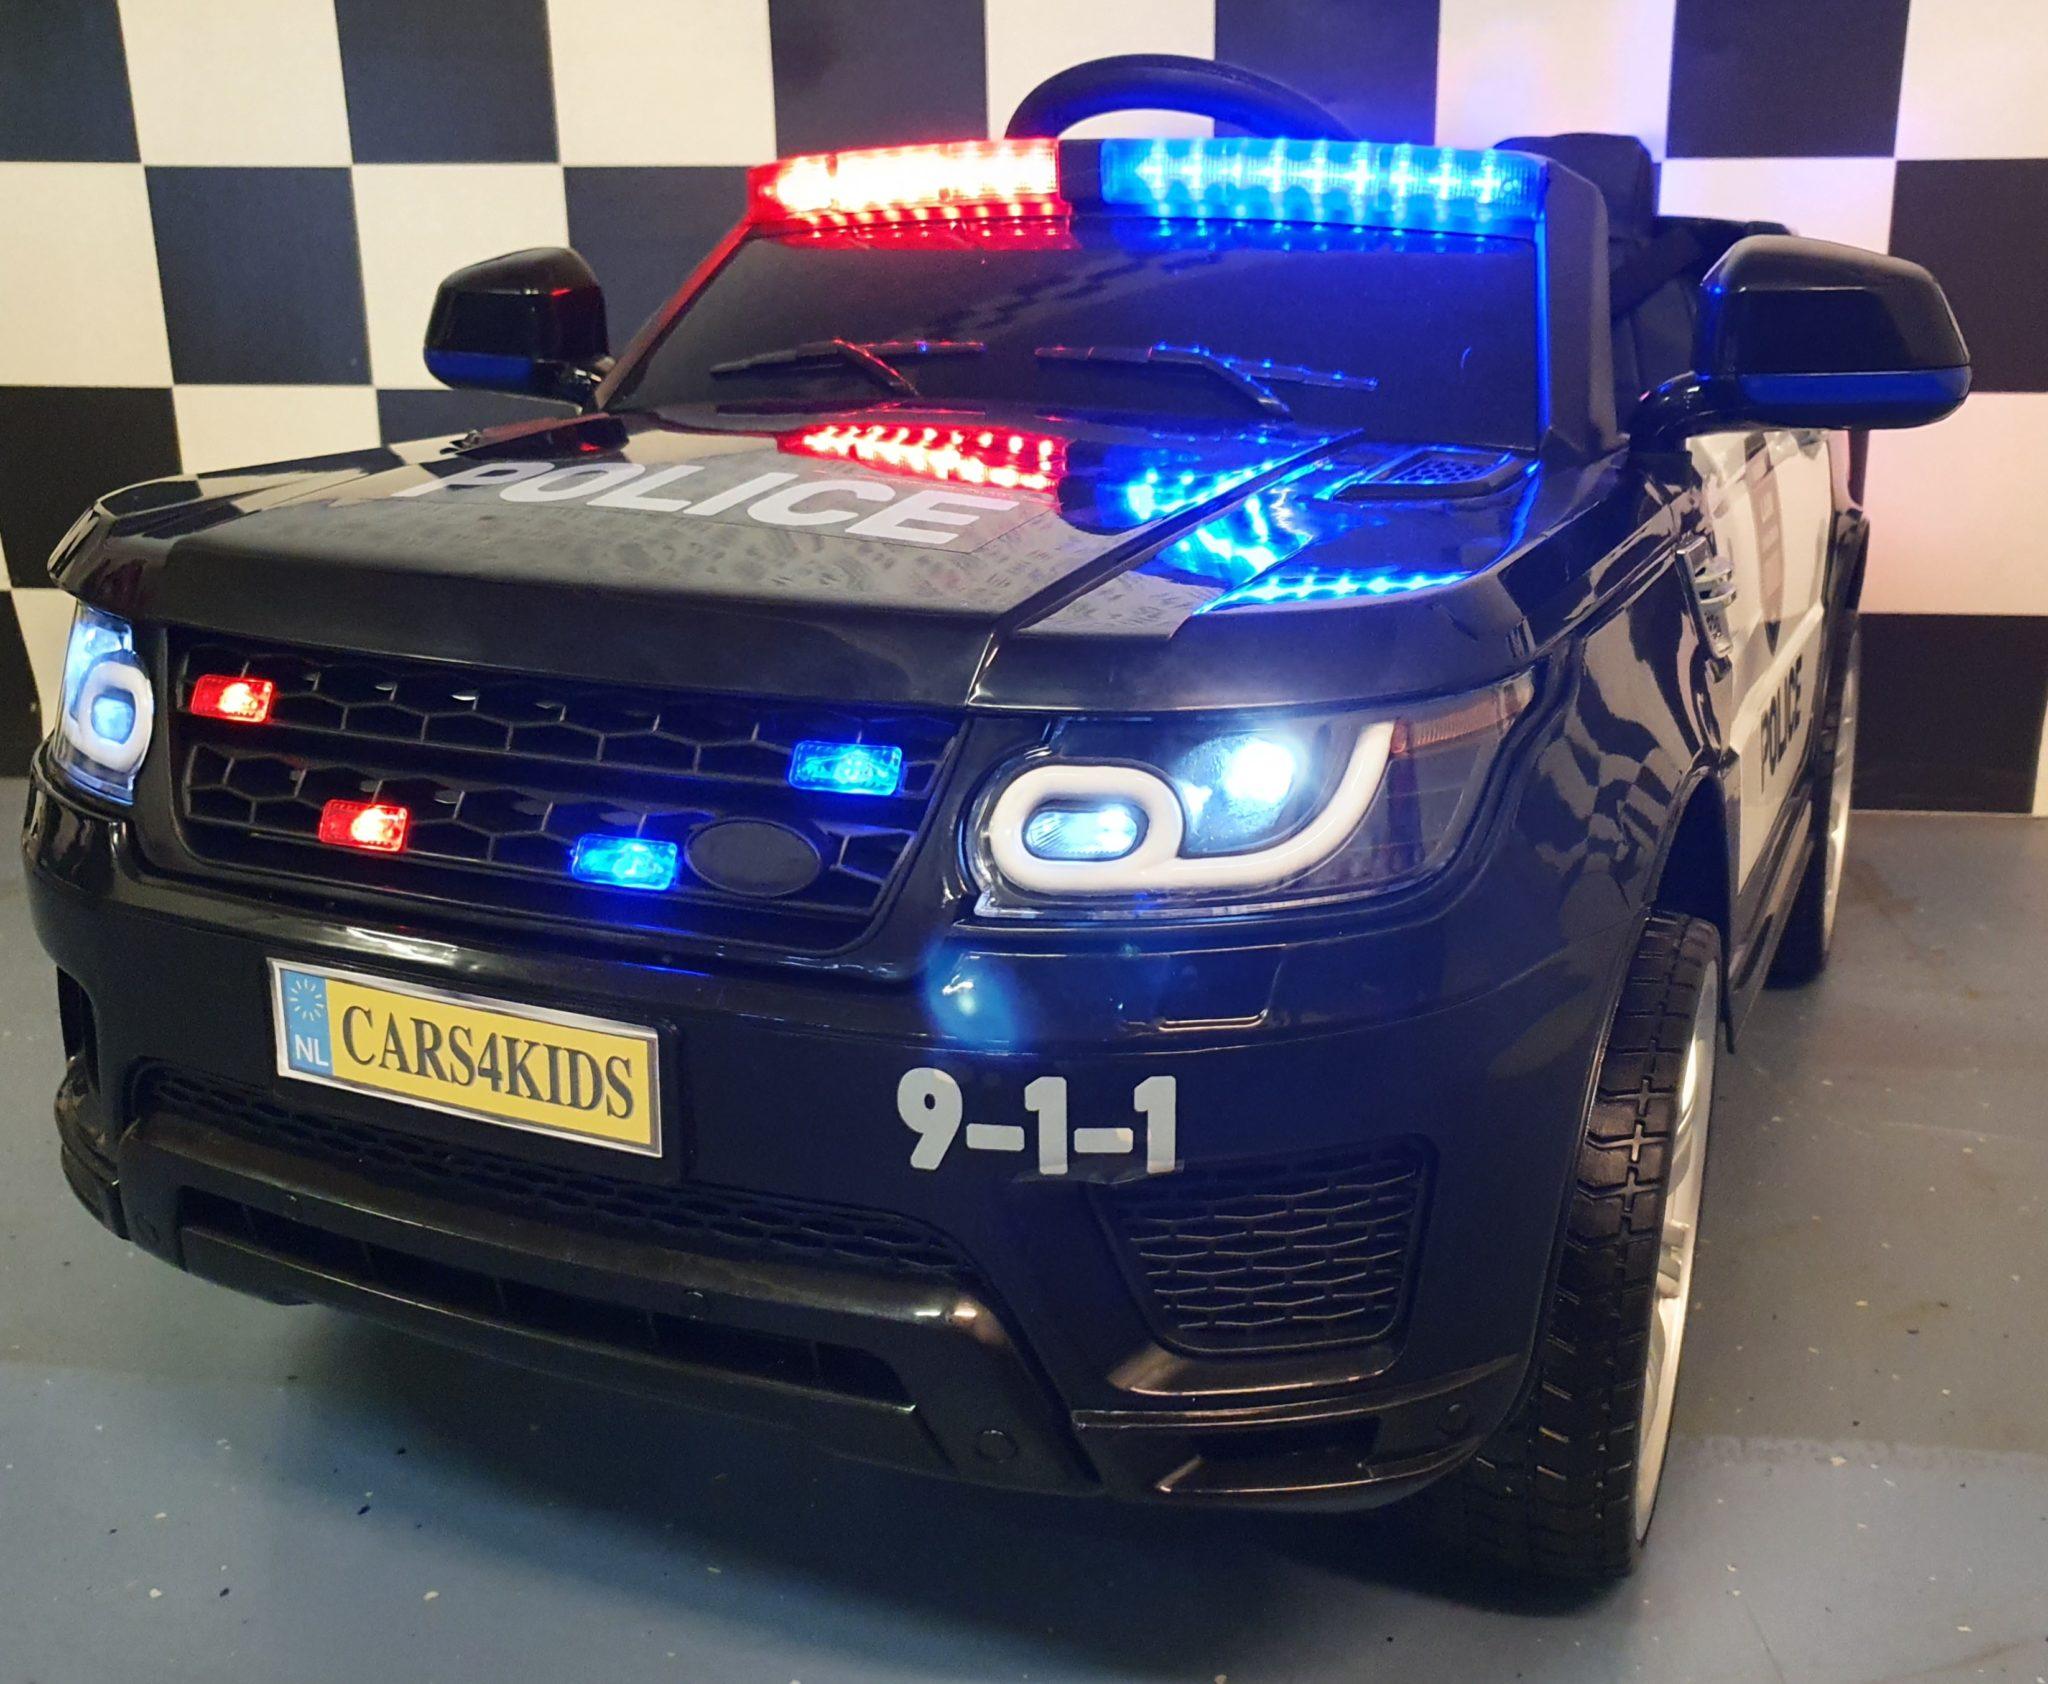 Politieauto elektrische speelgoed kinderjeep 12V 2.4G RC